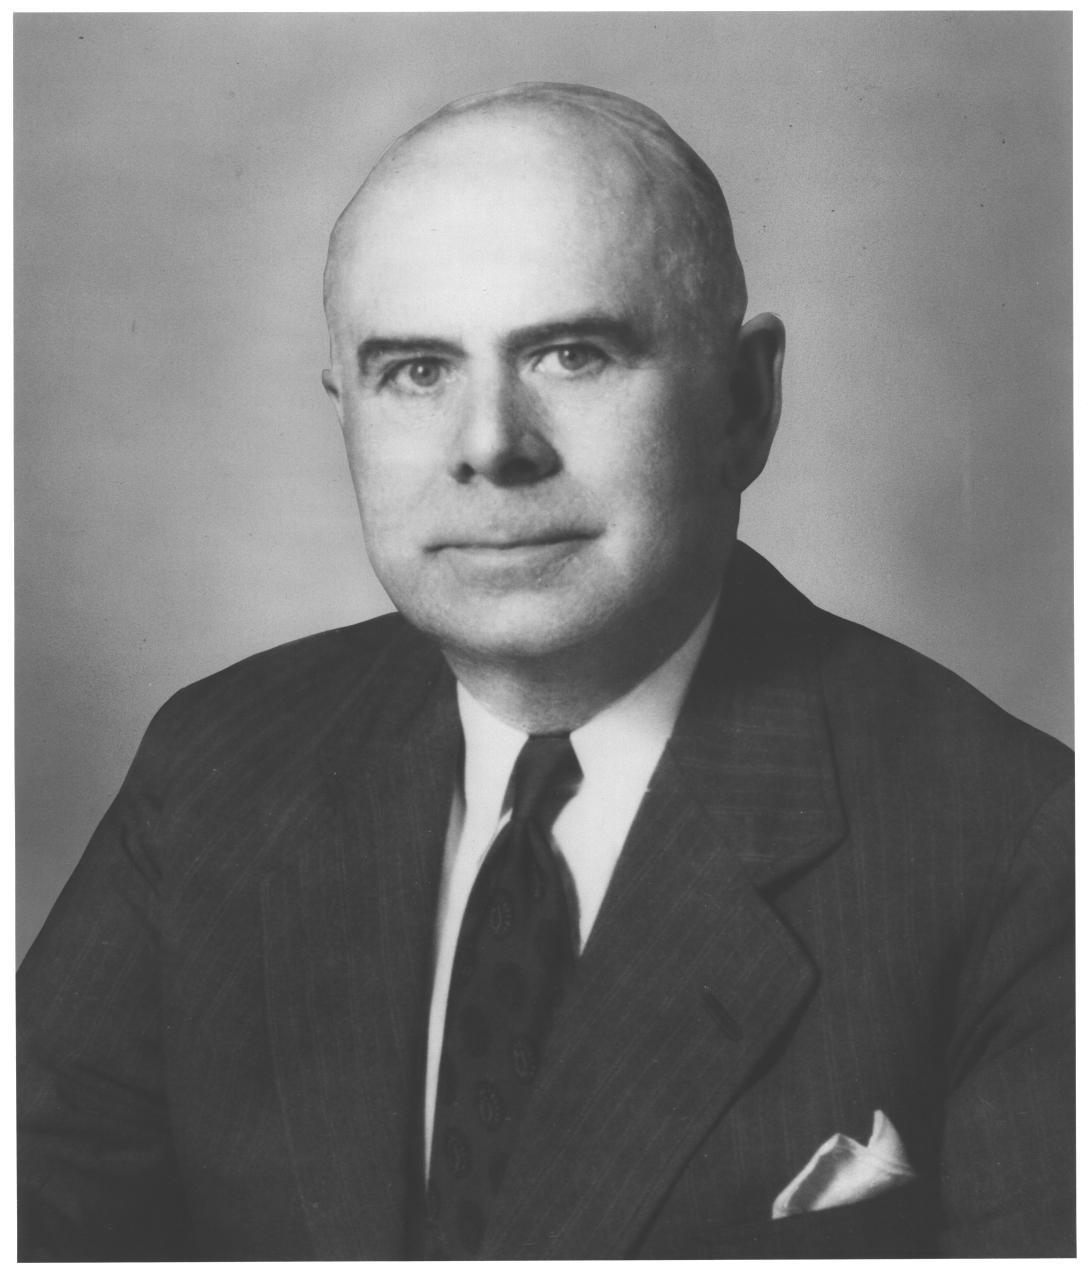 09SEP1948: Thomas MacDonald, pioneer US #highway administrator, accepts Amer Assn of Motor Vehicle Administrators Meritorious Award. #AAMVA https://t.co/dihp2duQ2d